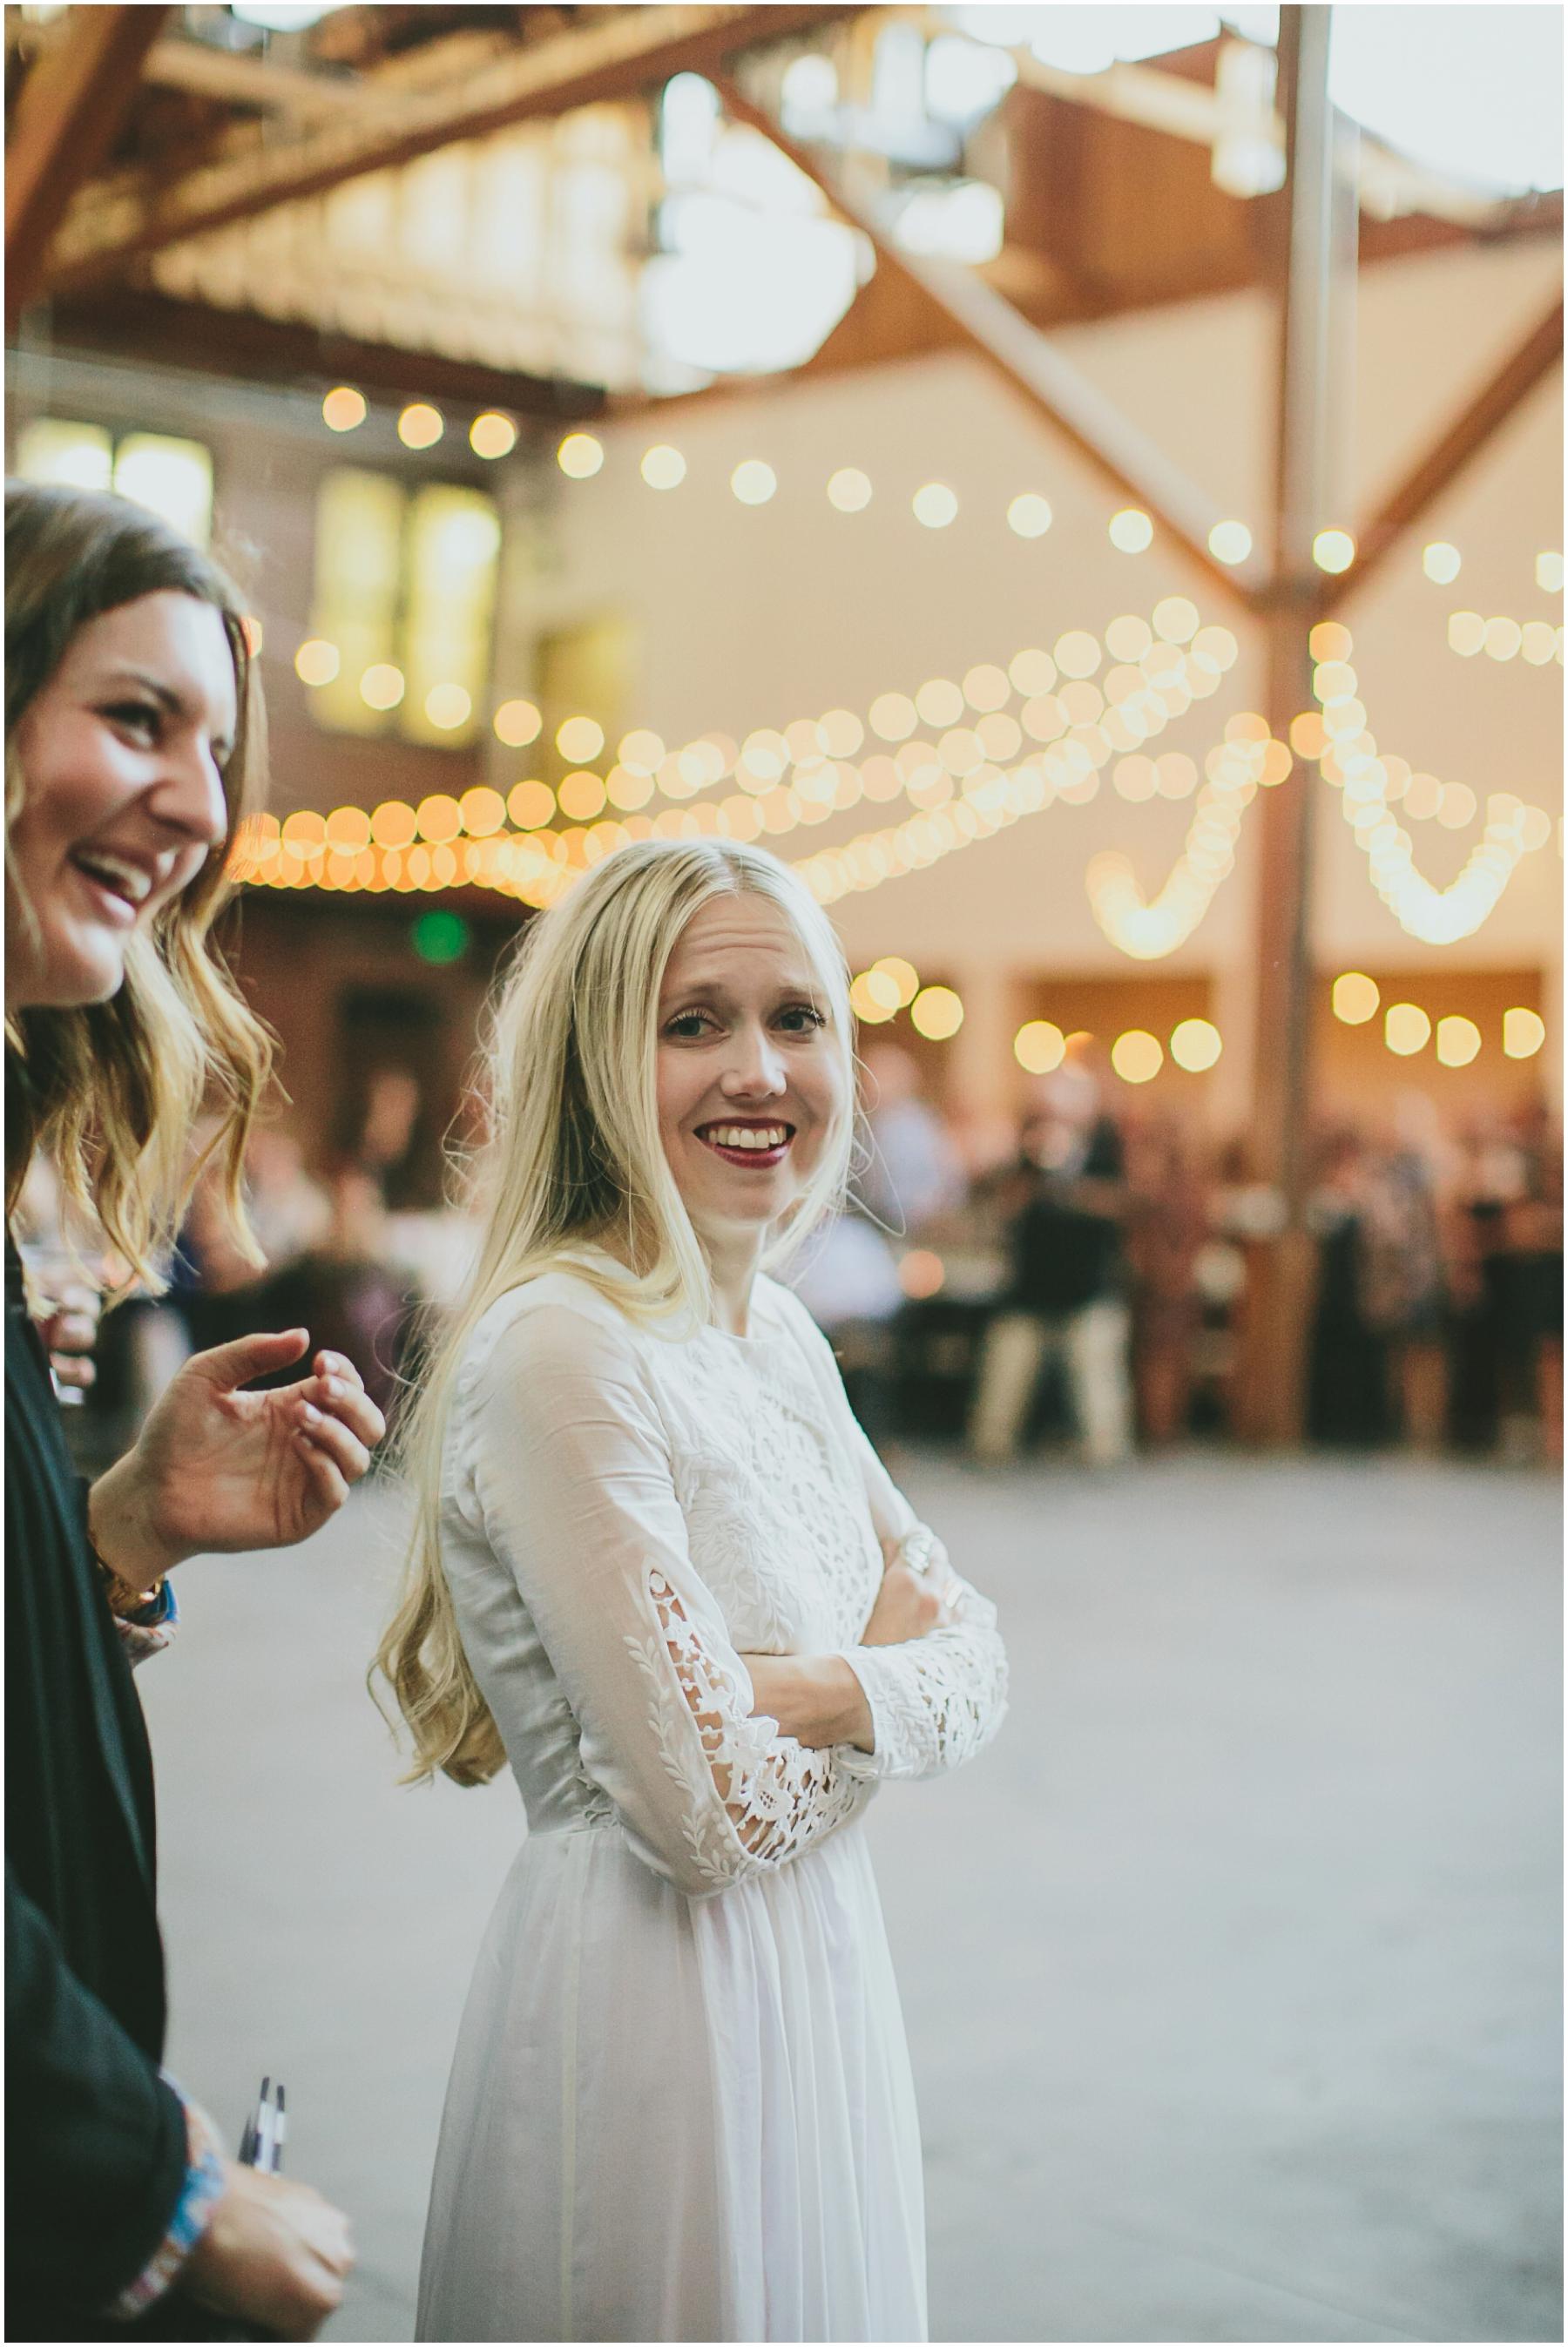 Natalie+Corey-WEDDING_KELLYBOITANO_0104